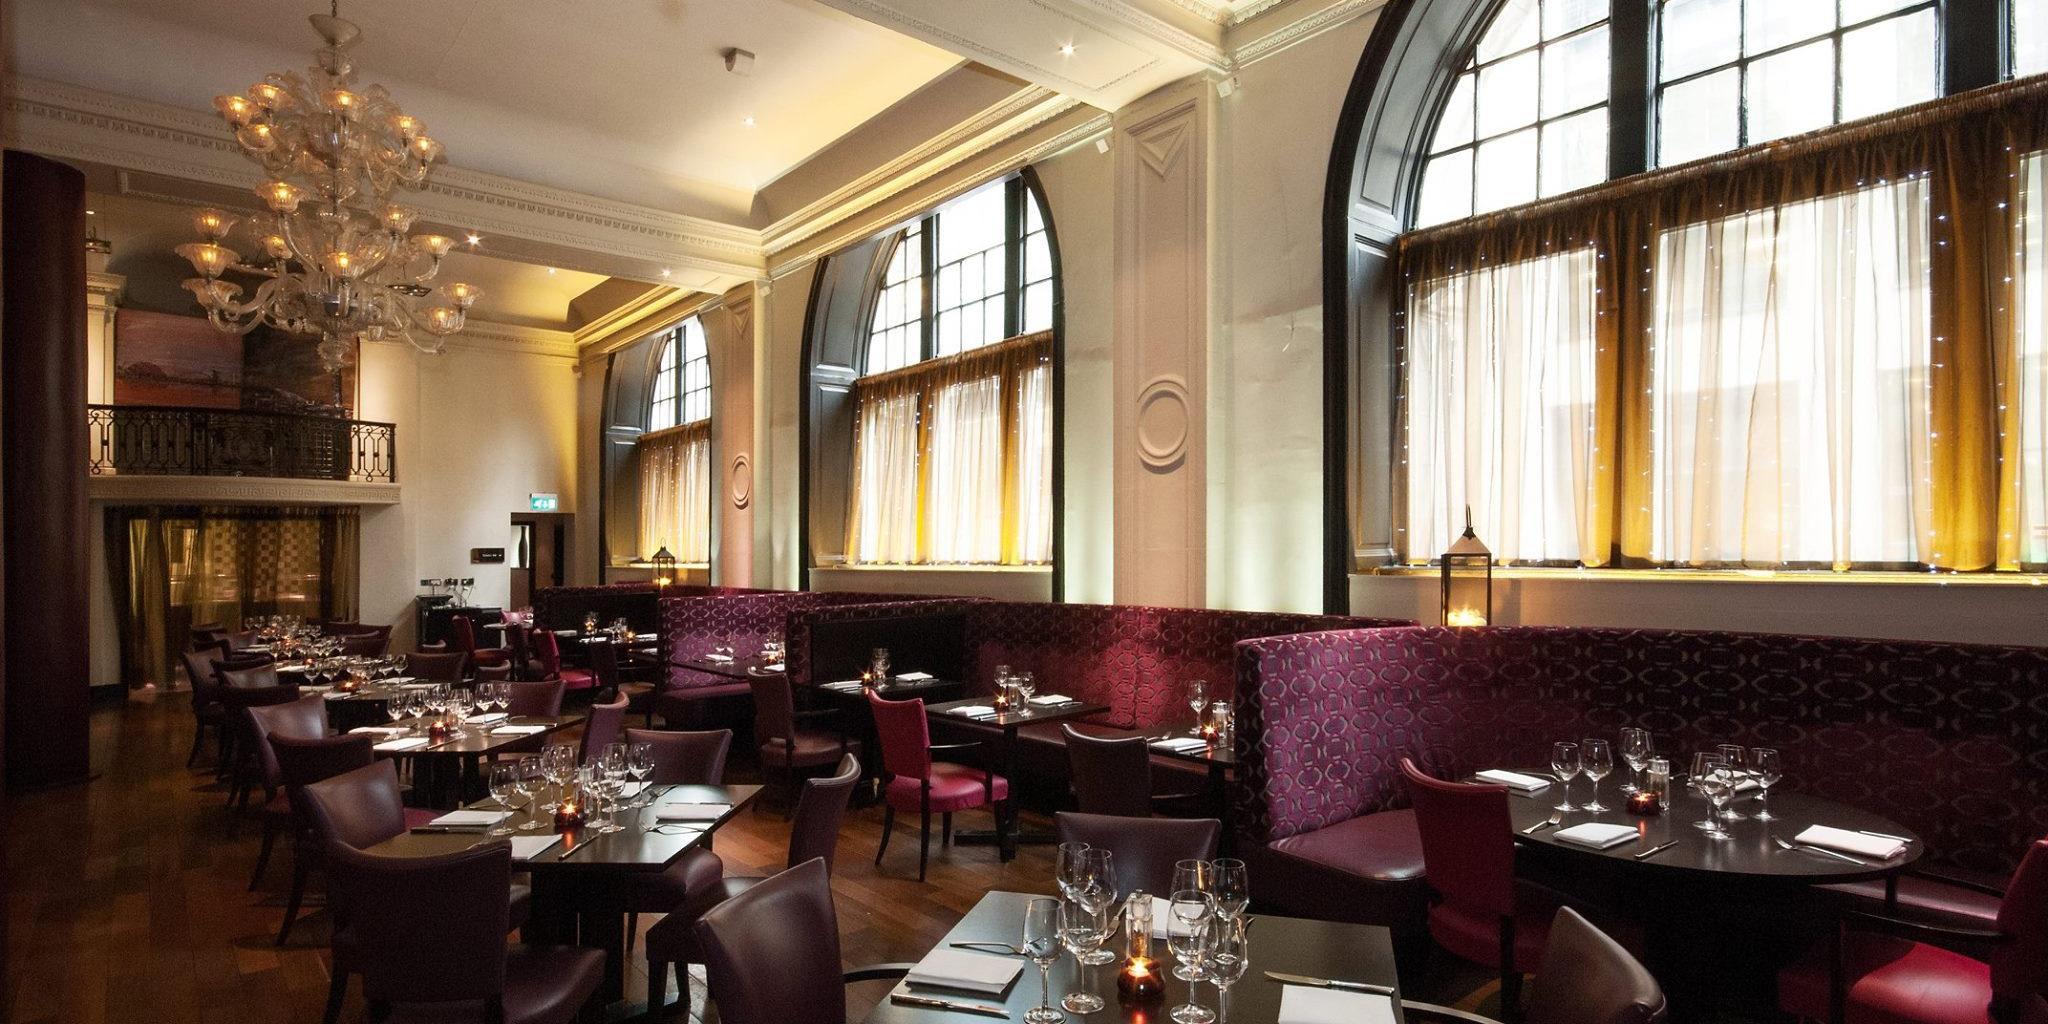 Dine in beautiful surroundings in Tempus restaurant, Grand Central